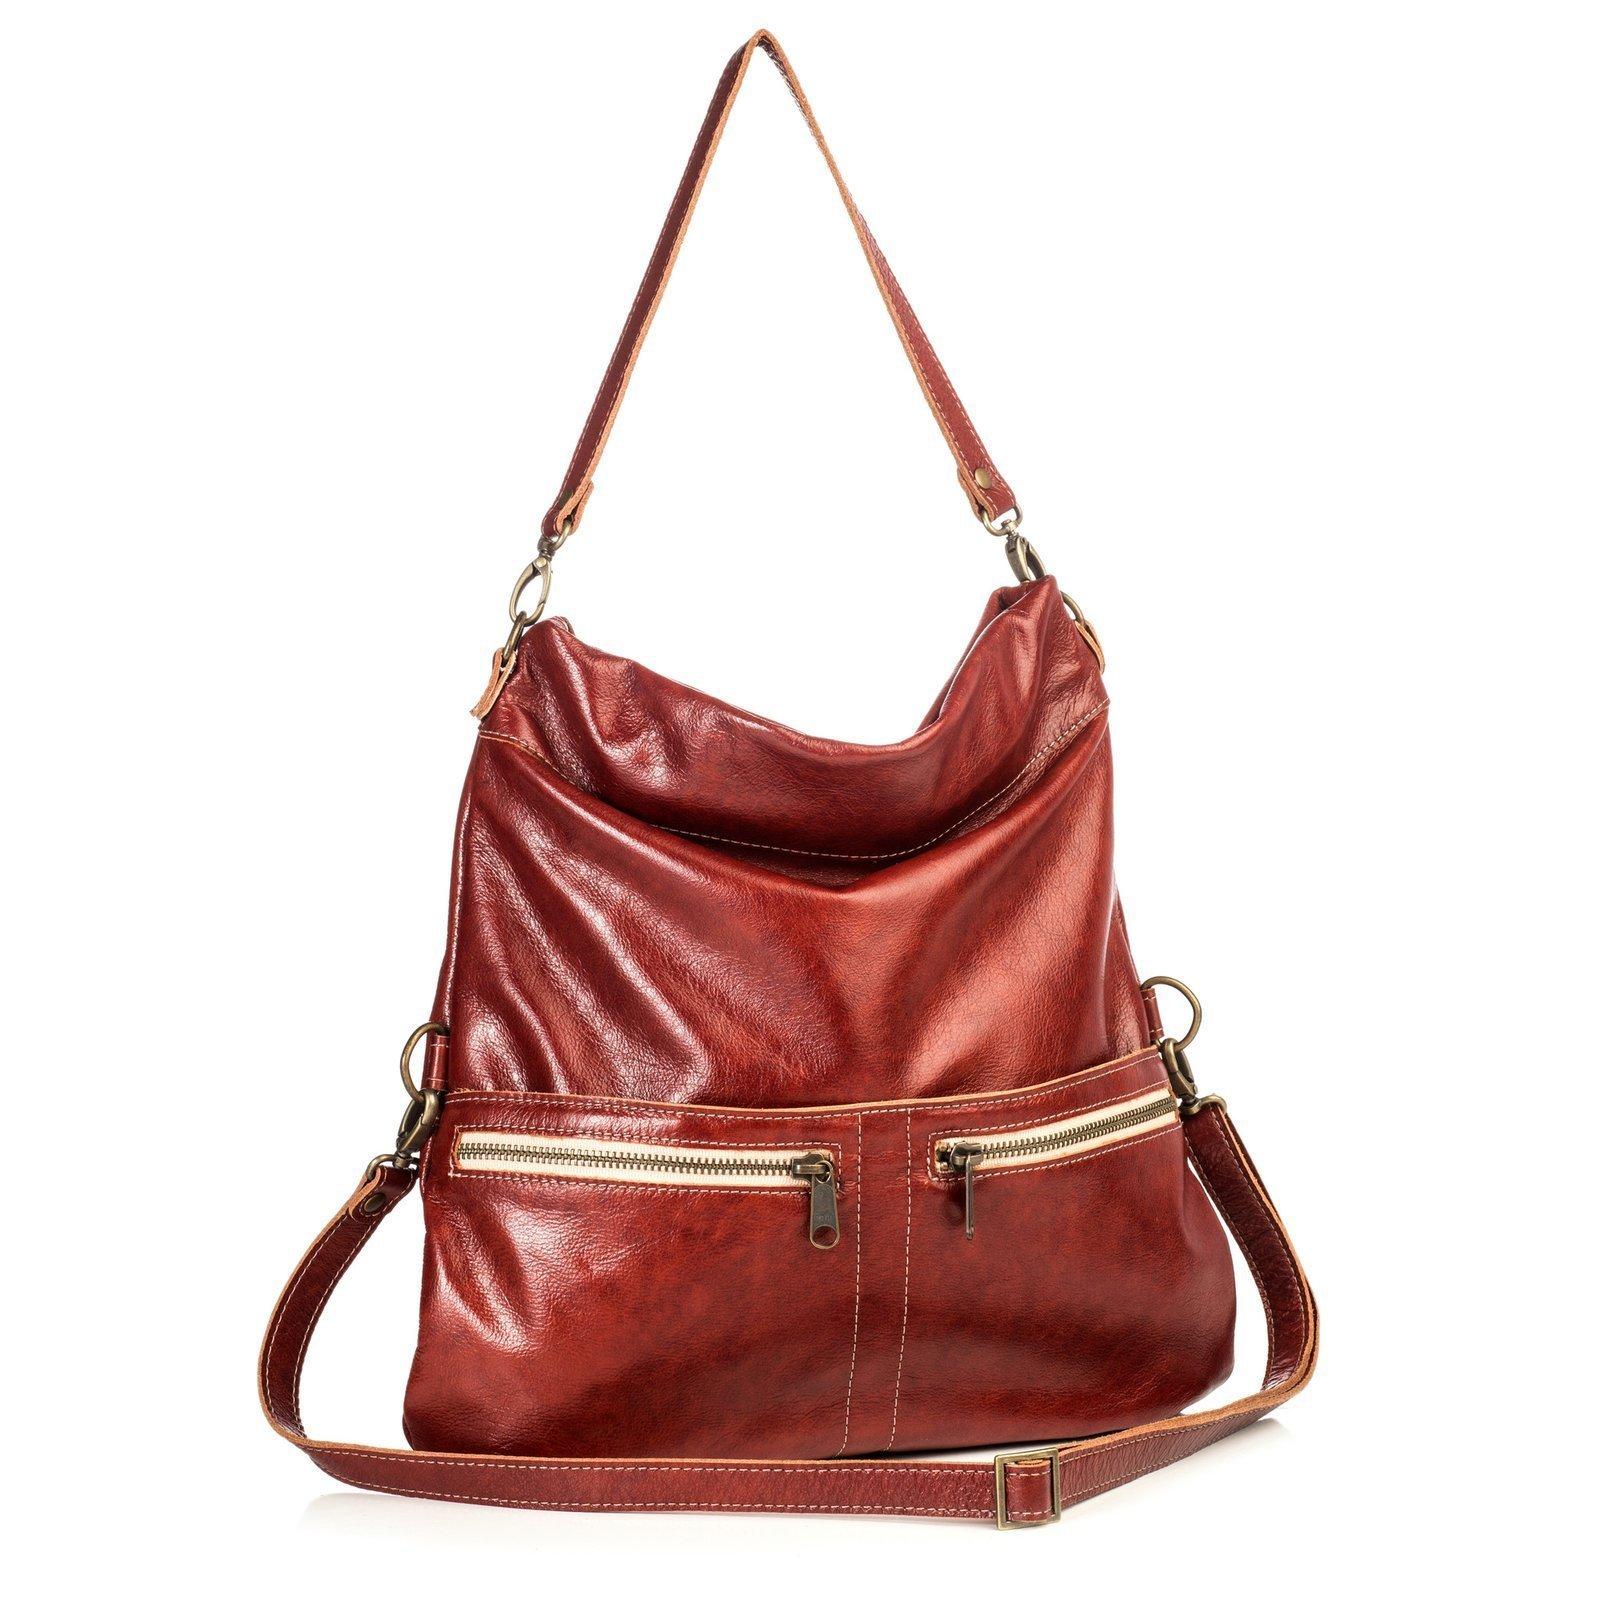 Rust Supple Italian Leather Medium Crossbody Bag